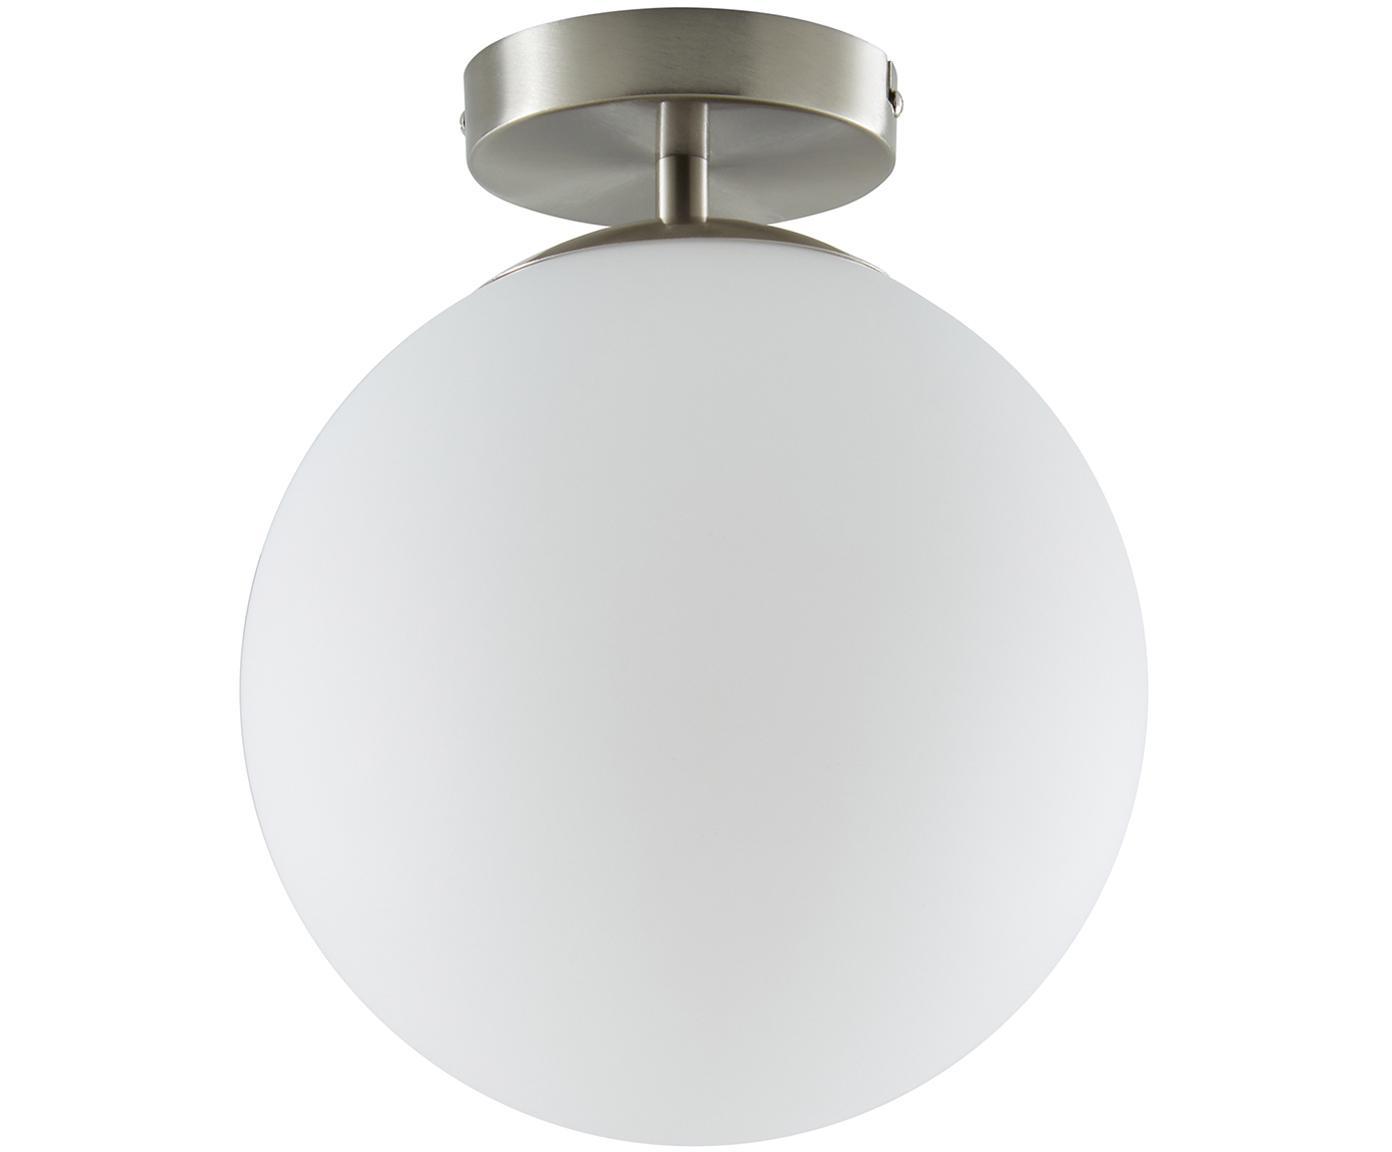 Lampada da soffitto Hitch, Paralume: vetro, Baldacchino e rilegatura: argento opaco Paralume: bianco, Ø 25 x Alt. 30 cm